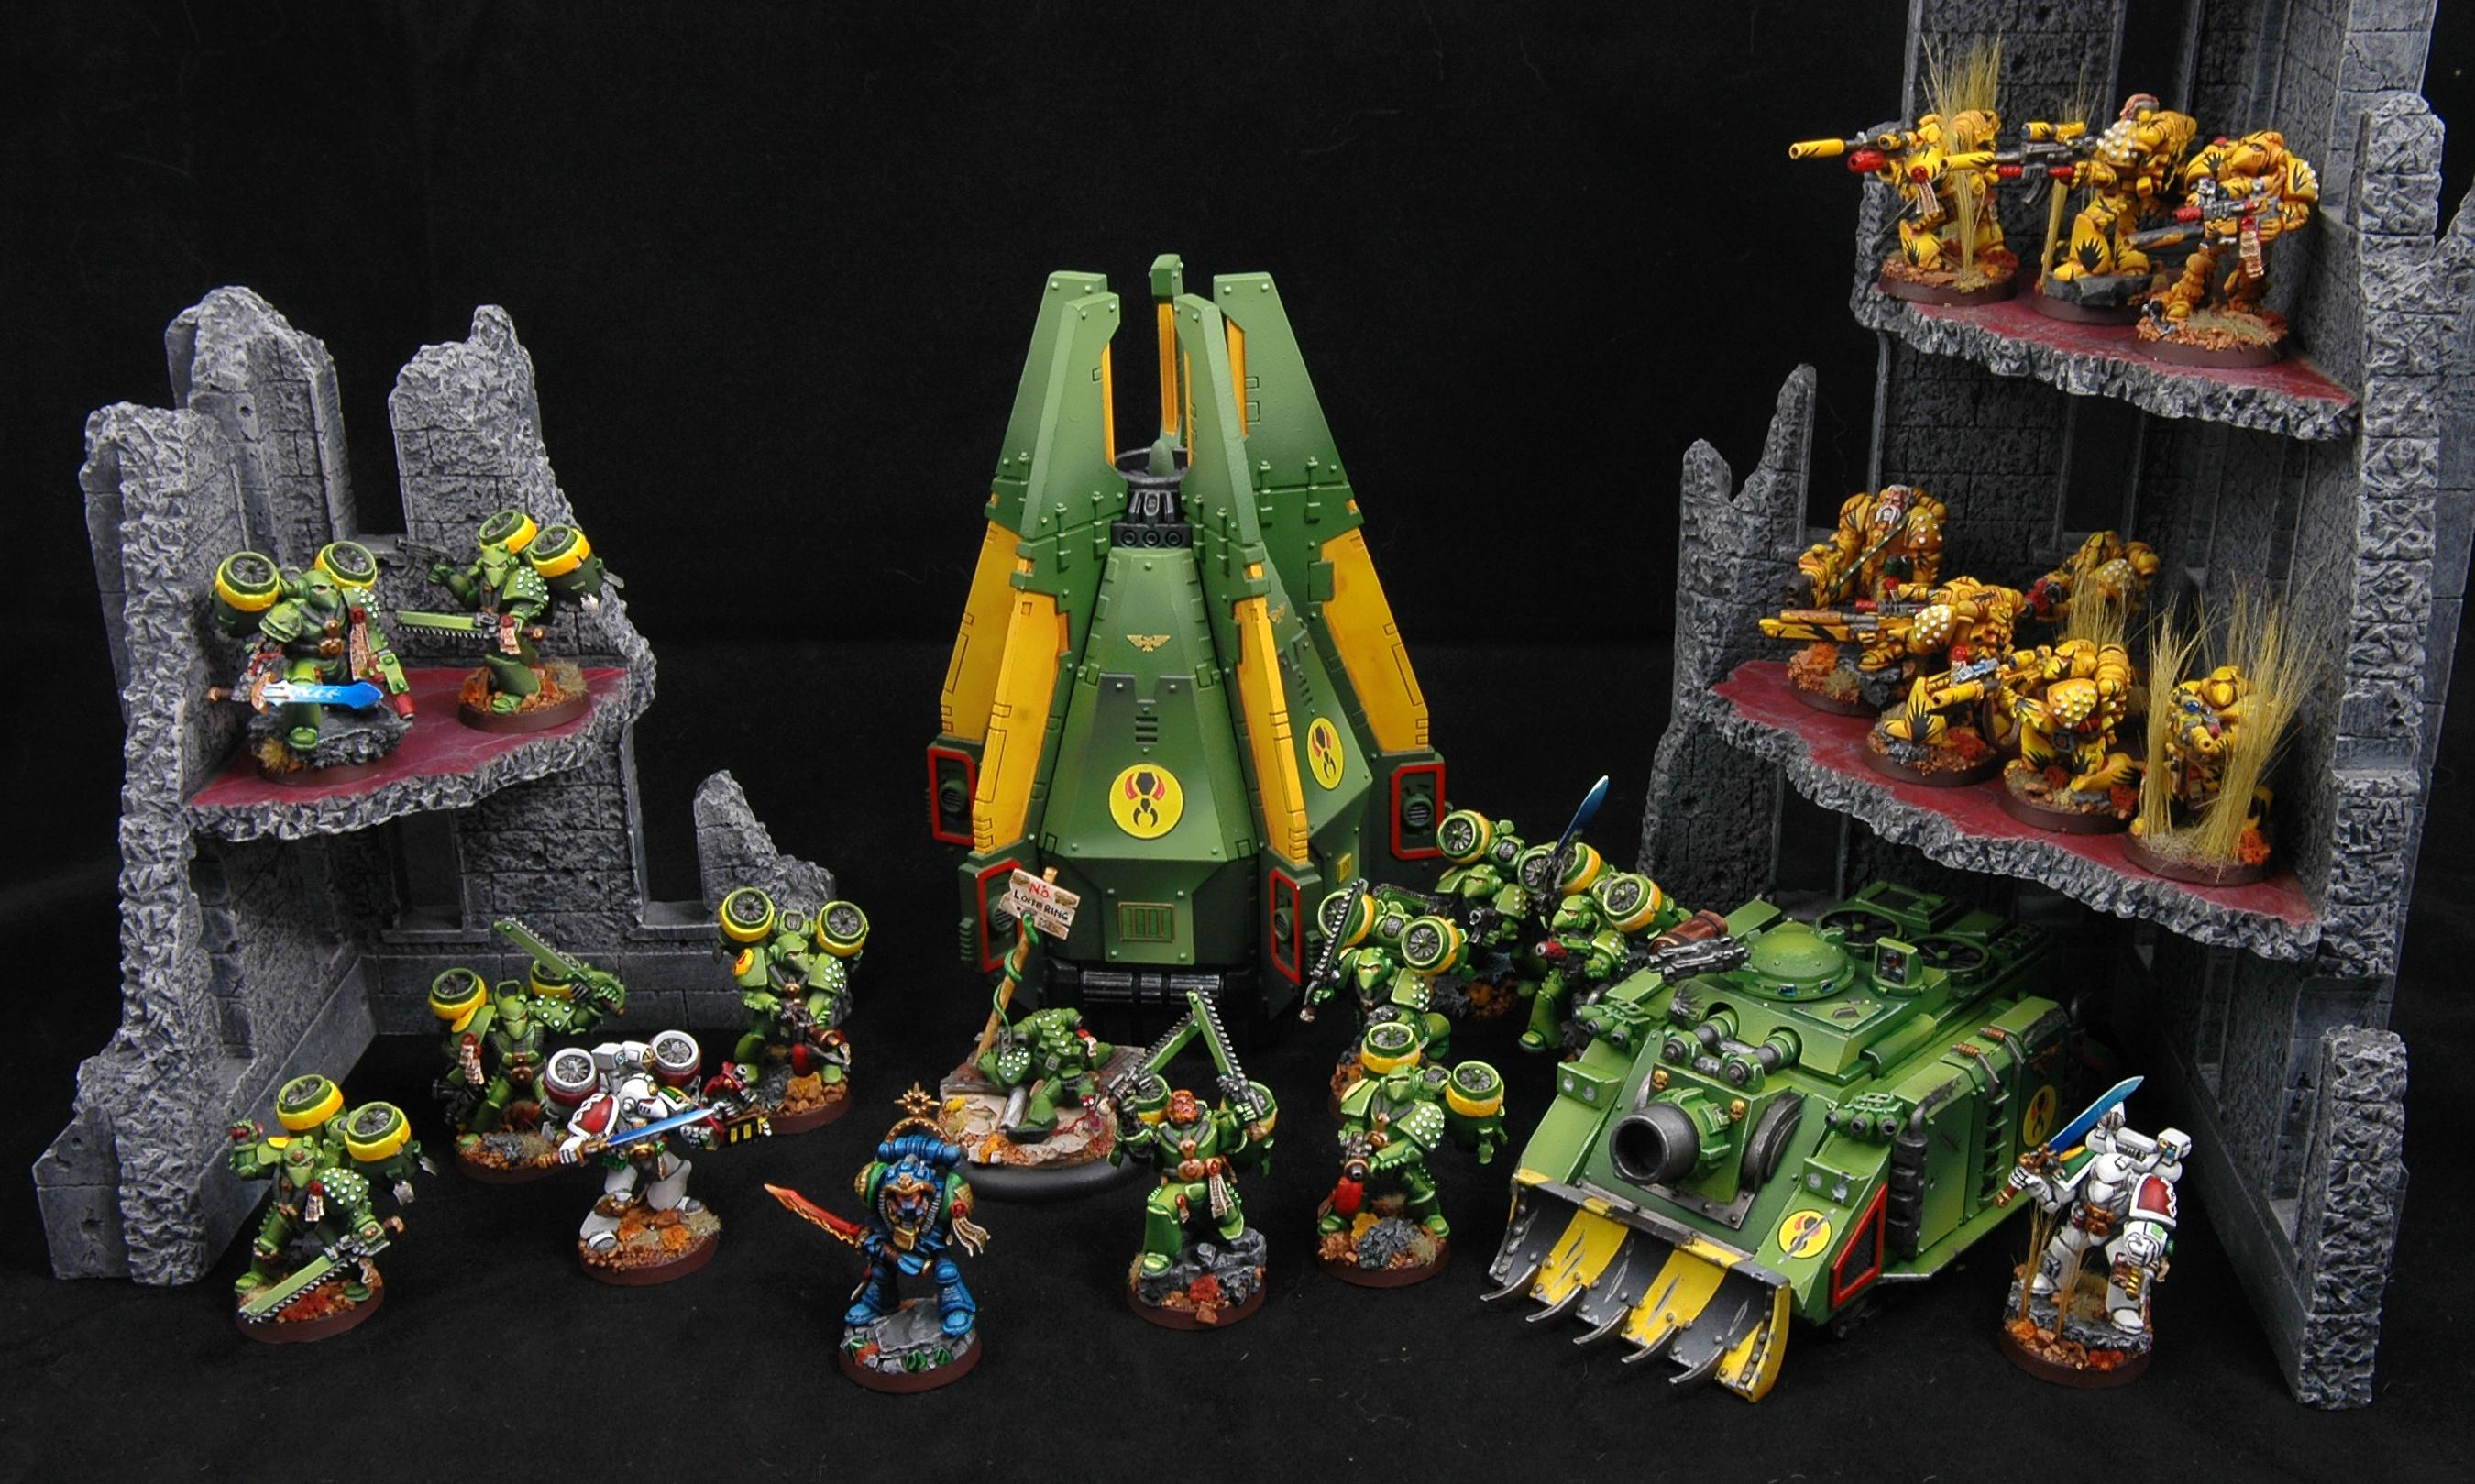 1000, Adepticon, Mantis Warriors, Rogue Trader, Space Marines, Warhammer 40,000